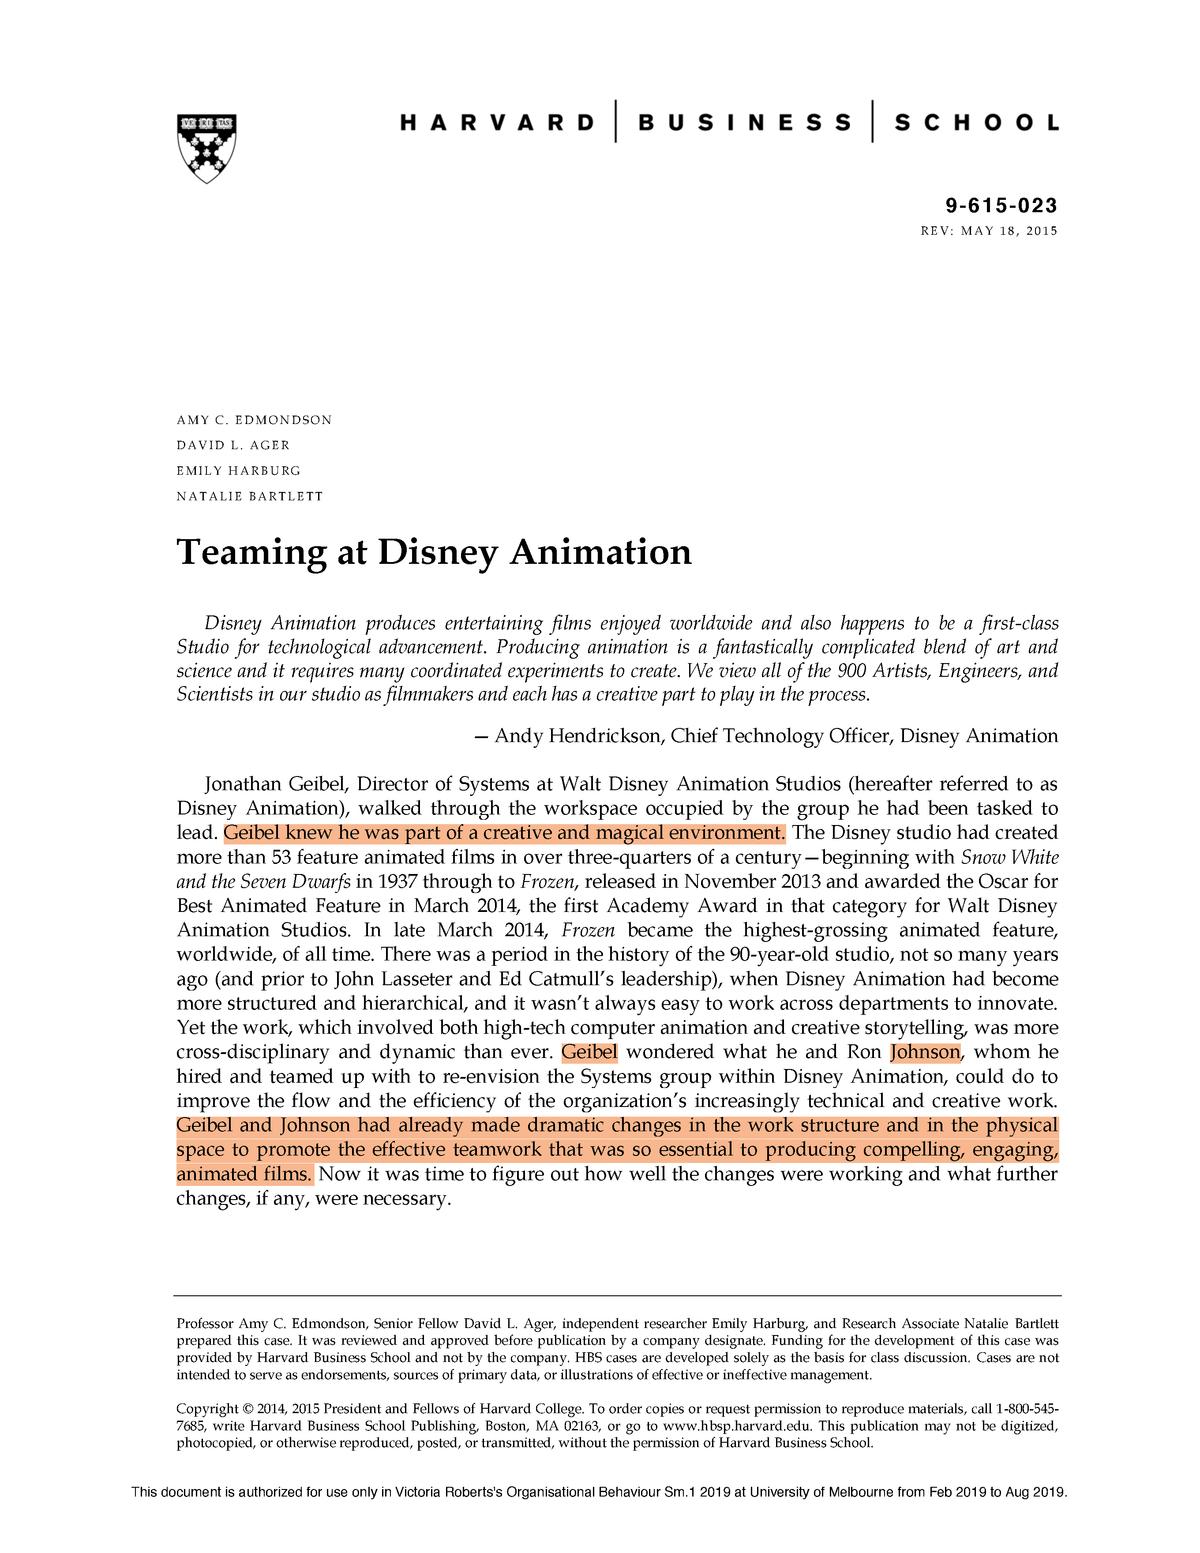 Teaming at Disney Animation copy - MGMT20001: Organisational